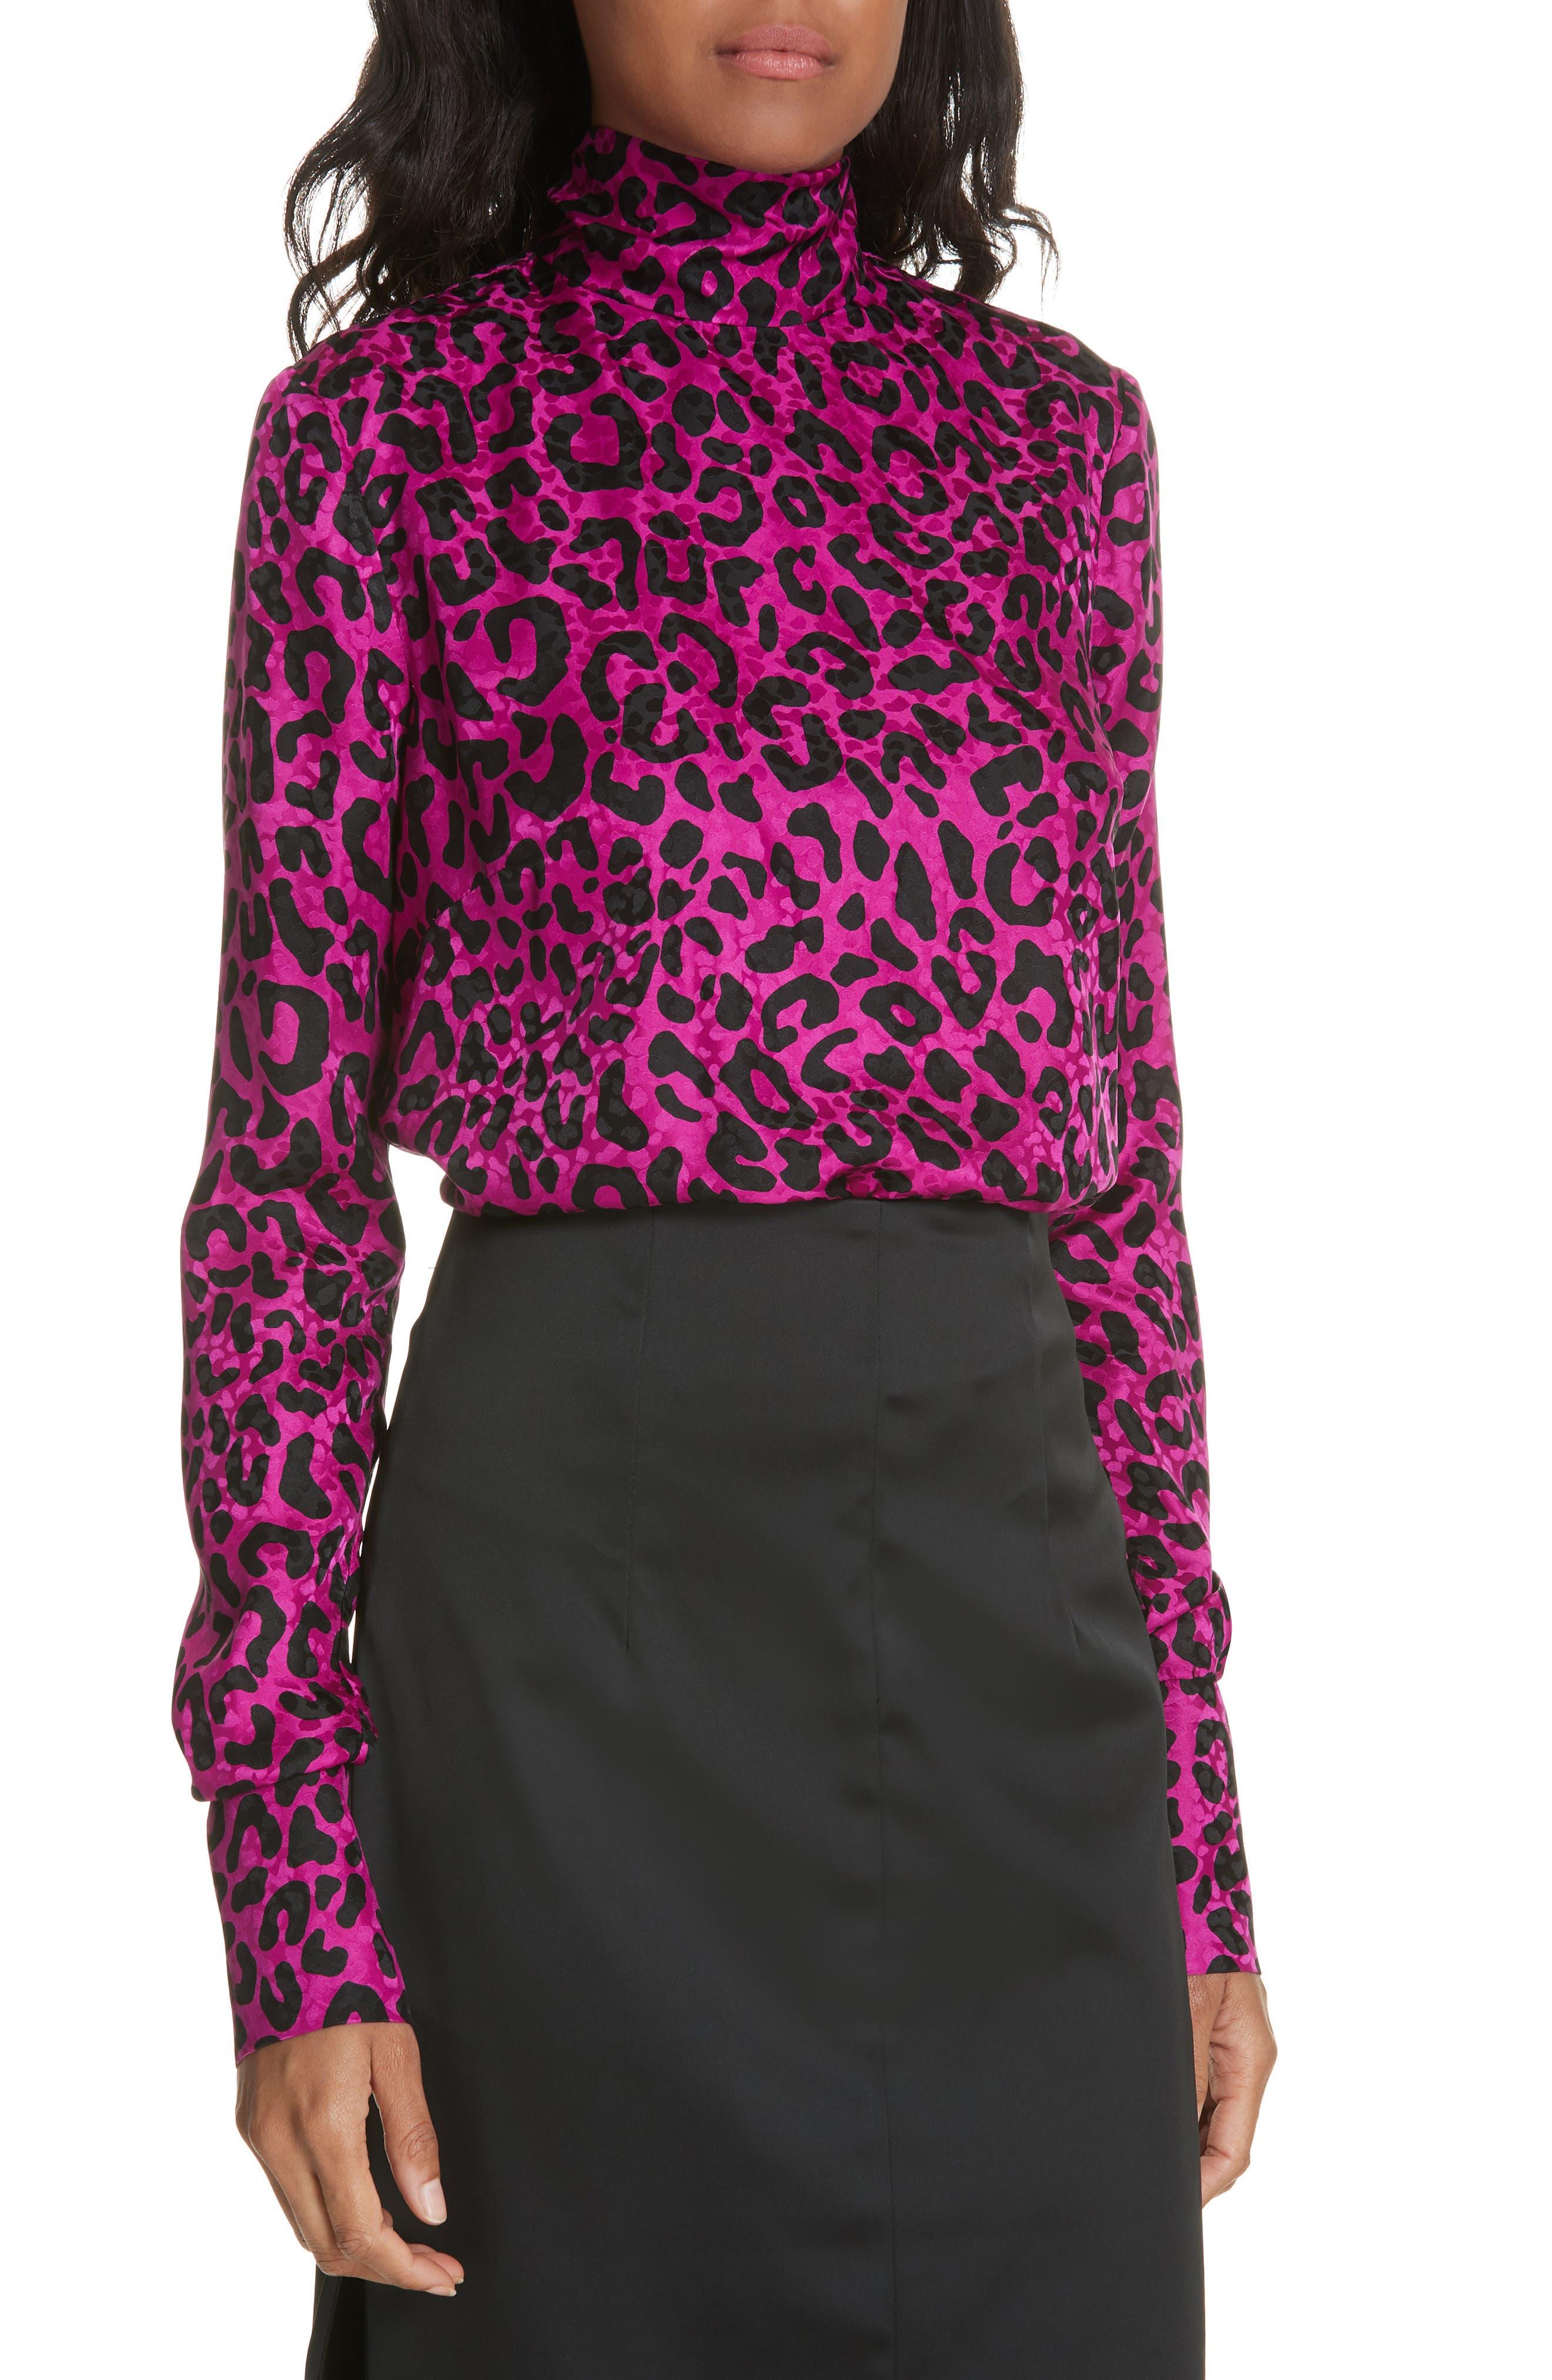 Leopard Print Silk Jacquard Top,                             Main thumbnail 1, color,                             673